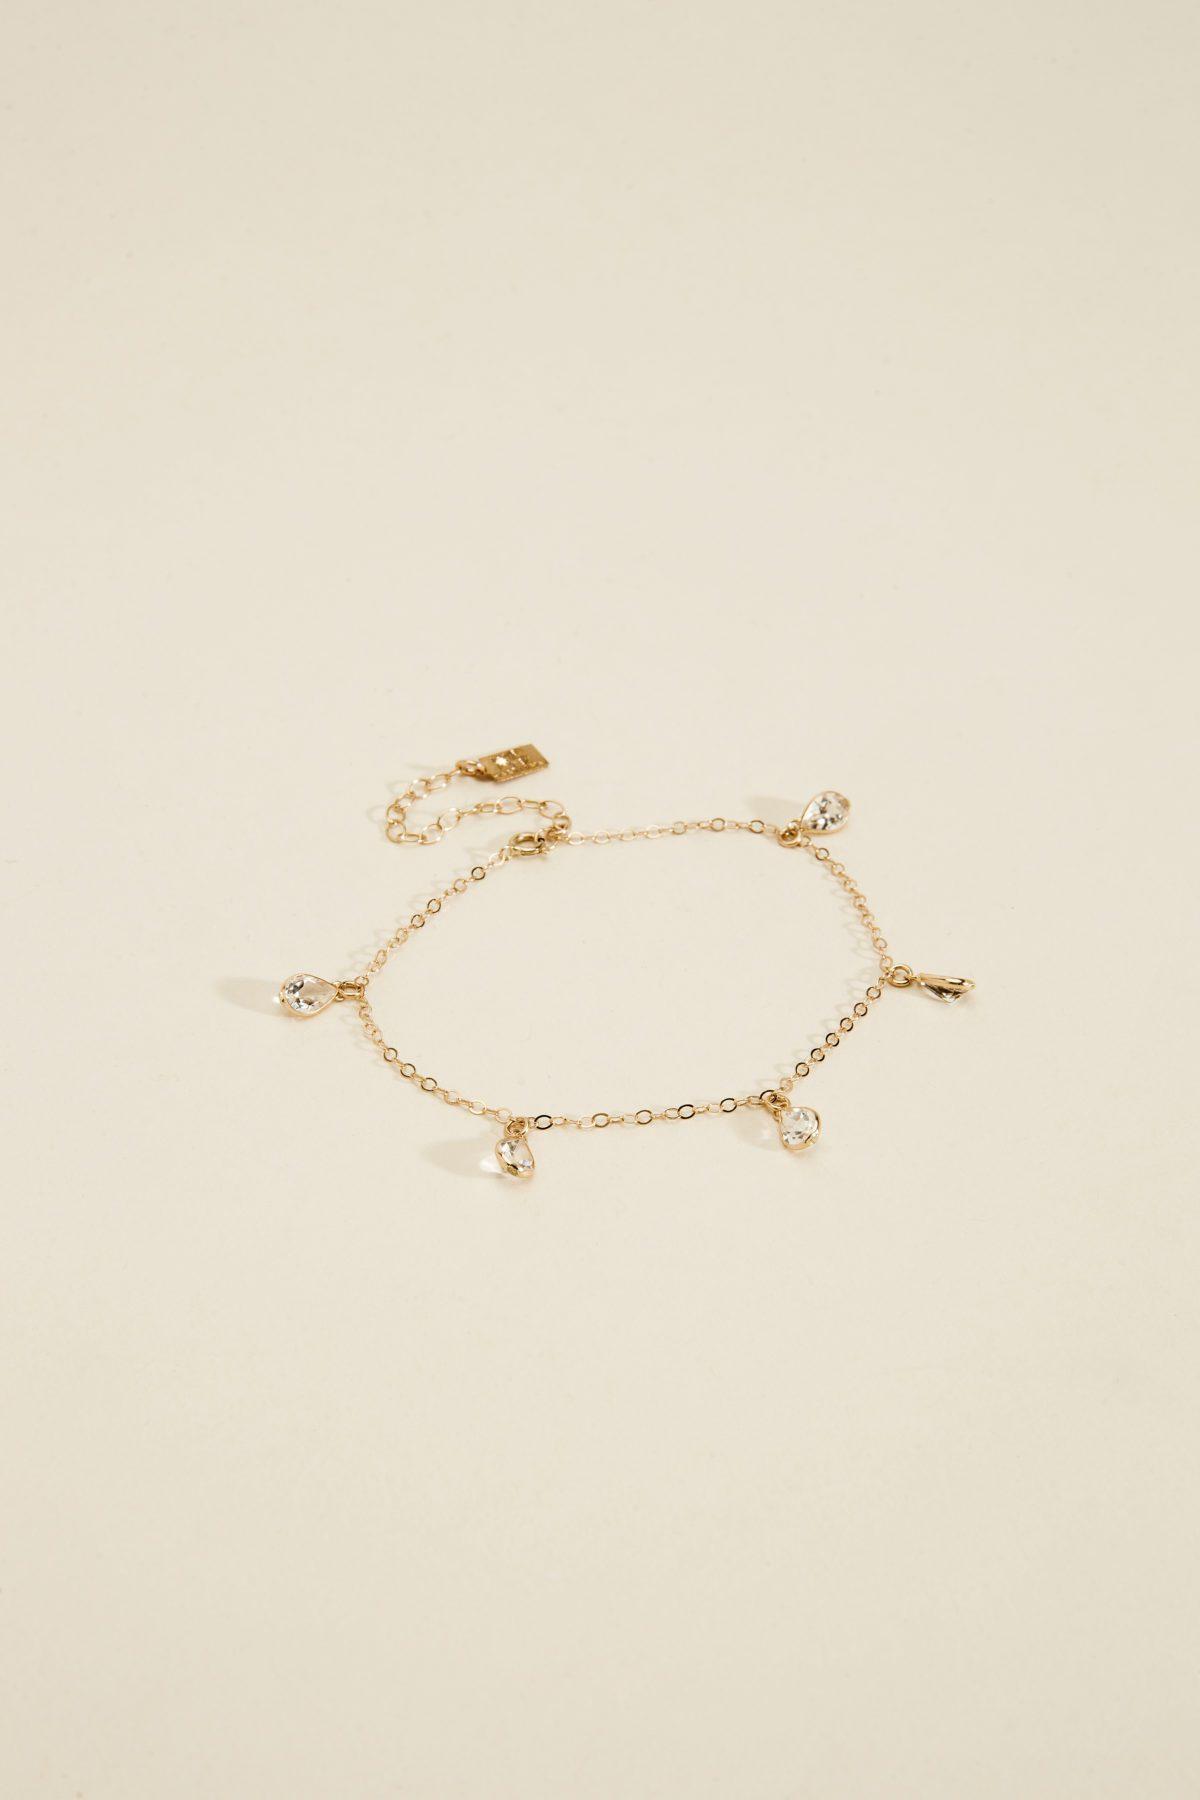 Alessandra Bracelet Haati Chai jewelry wear fashion los angeles in the pursuit